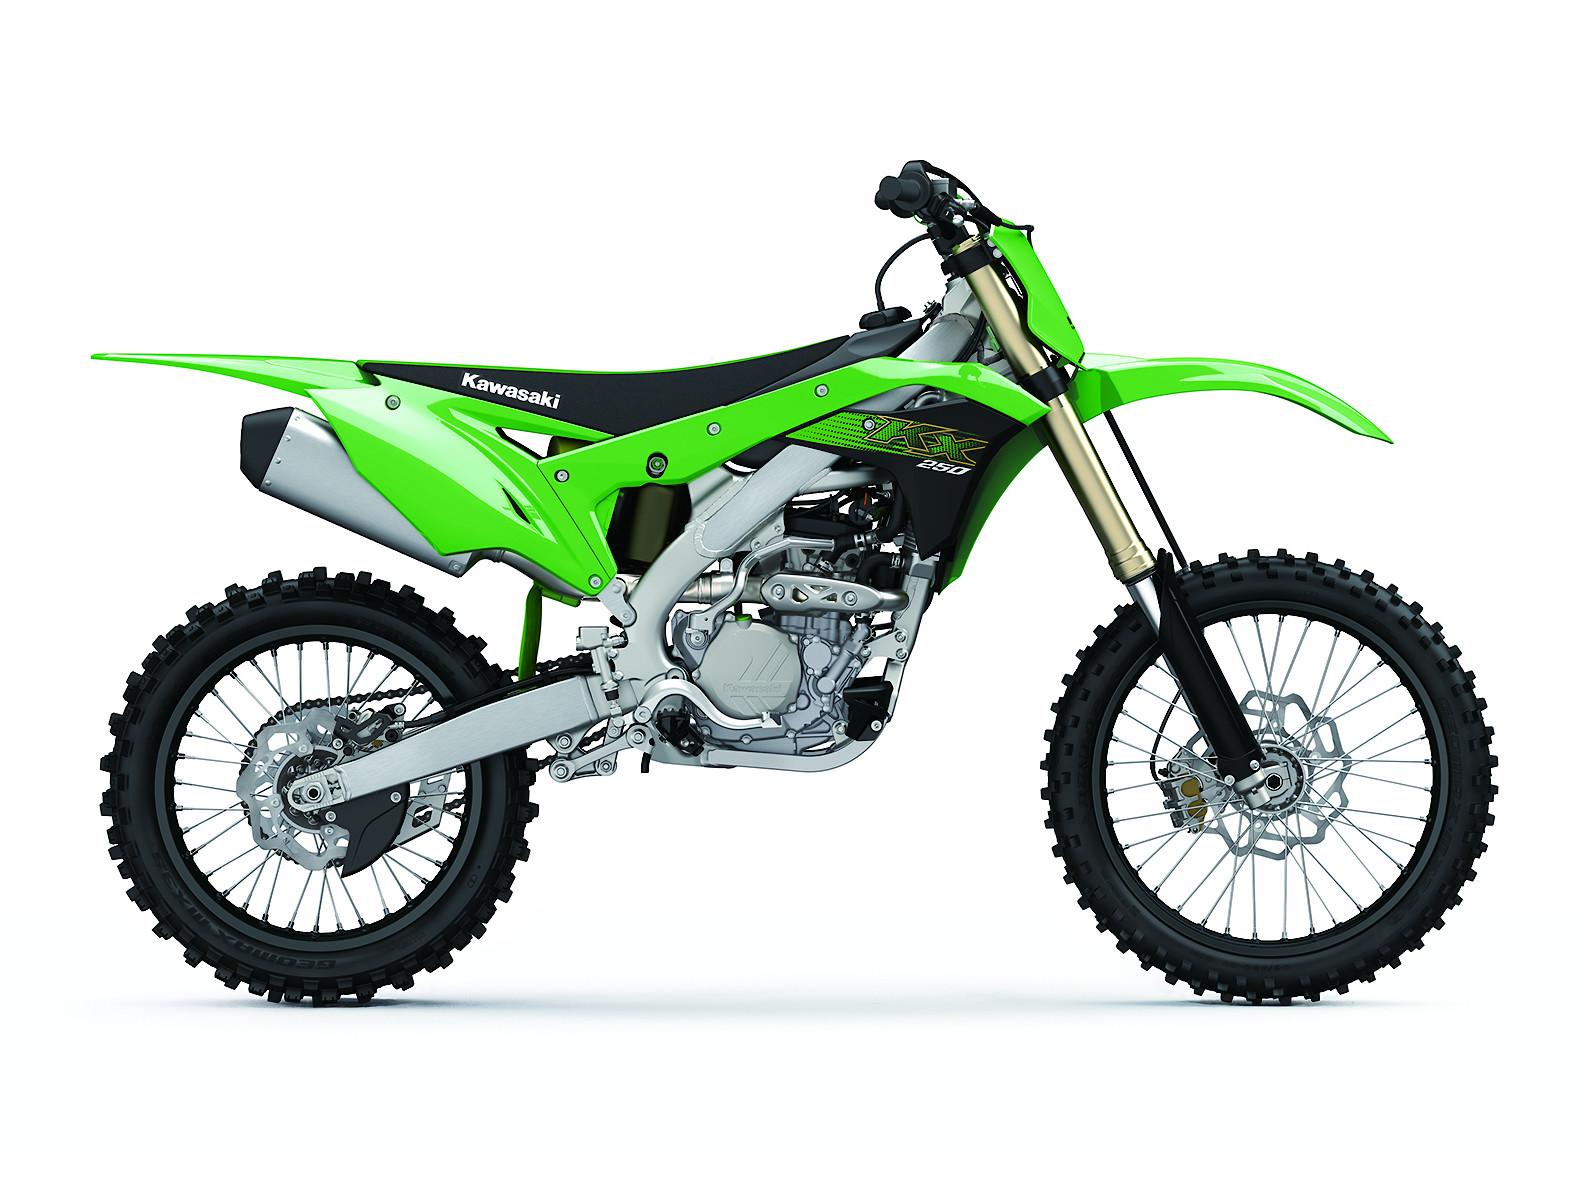 2020 Kawasaki KX250 - Reviews, Comparisons, Specs